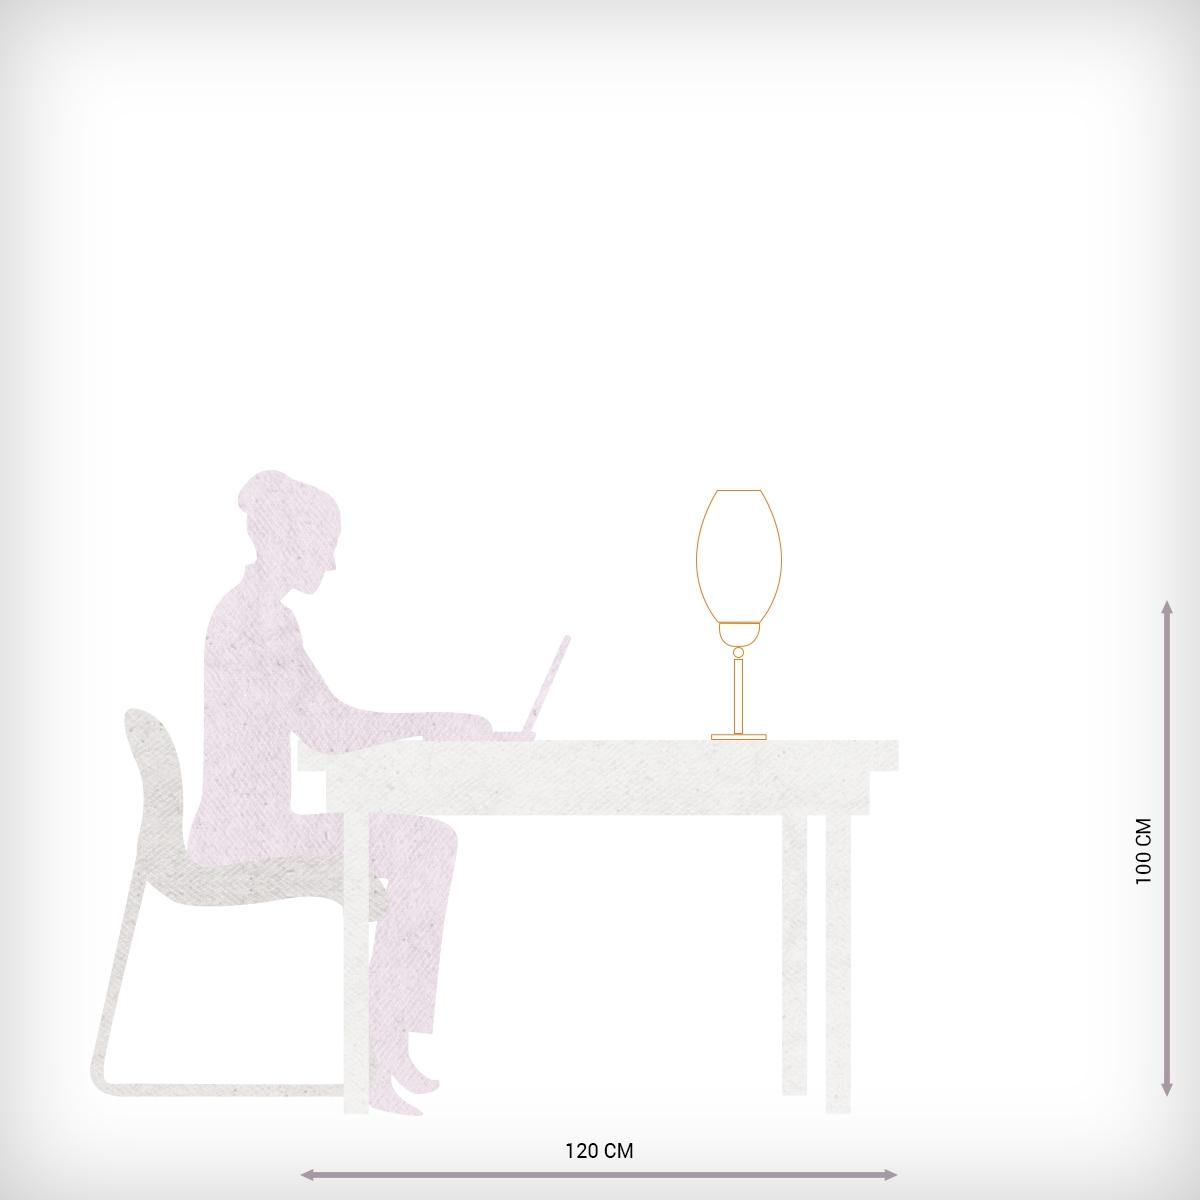 Chevet Transparent Un Avec Lampe Murano De Diffuseur Verre En qUzMpSV